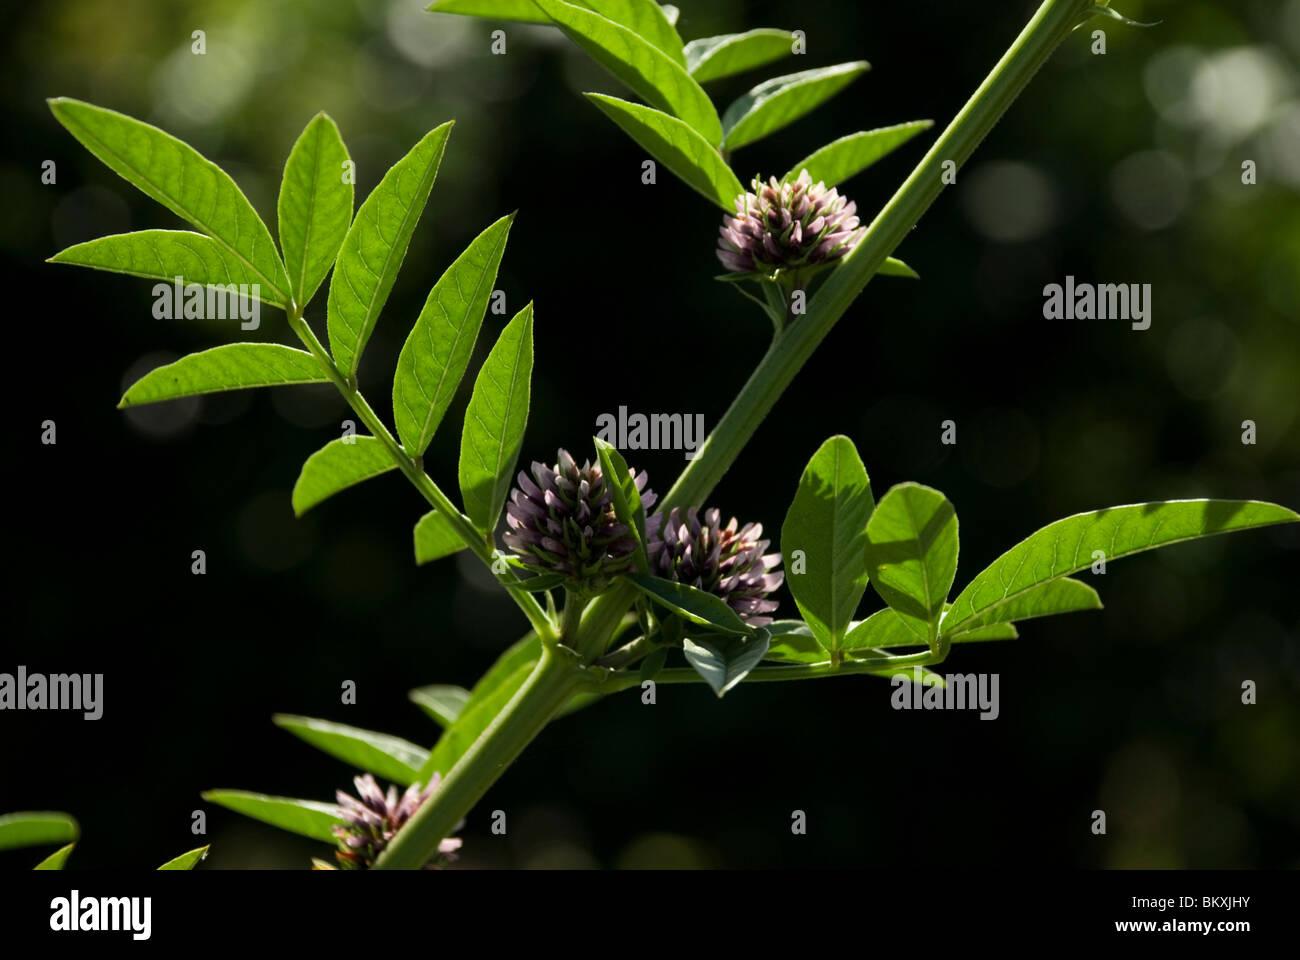 Glycyrrhiza glabra, Liquorice Stock Photo